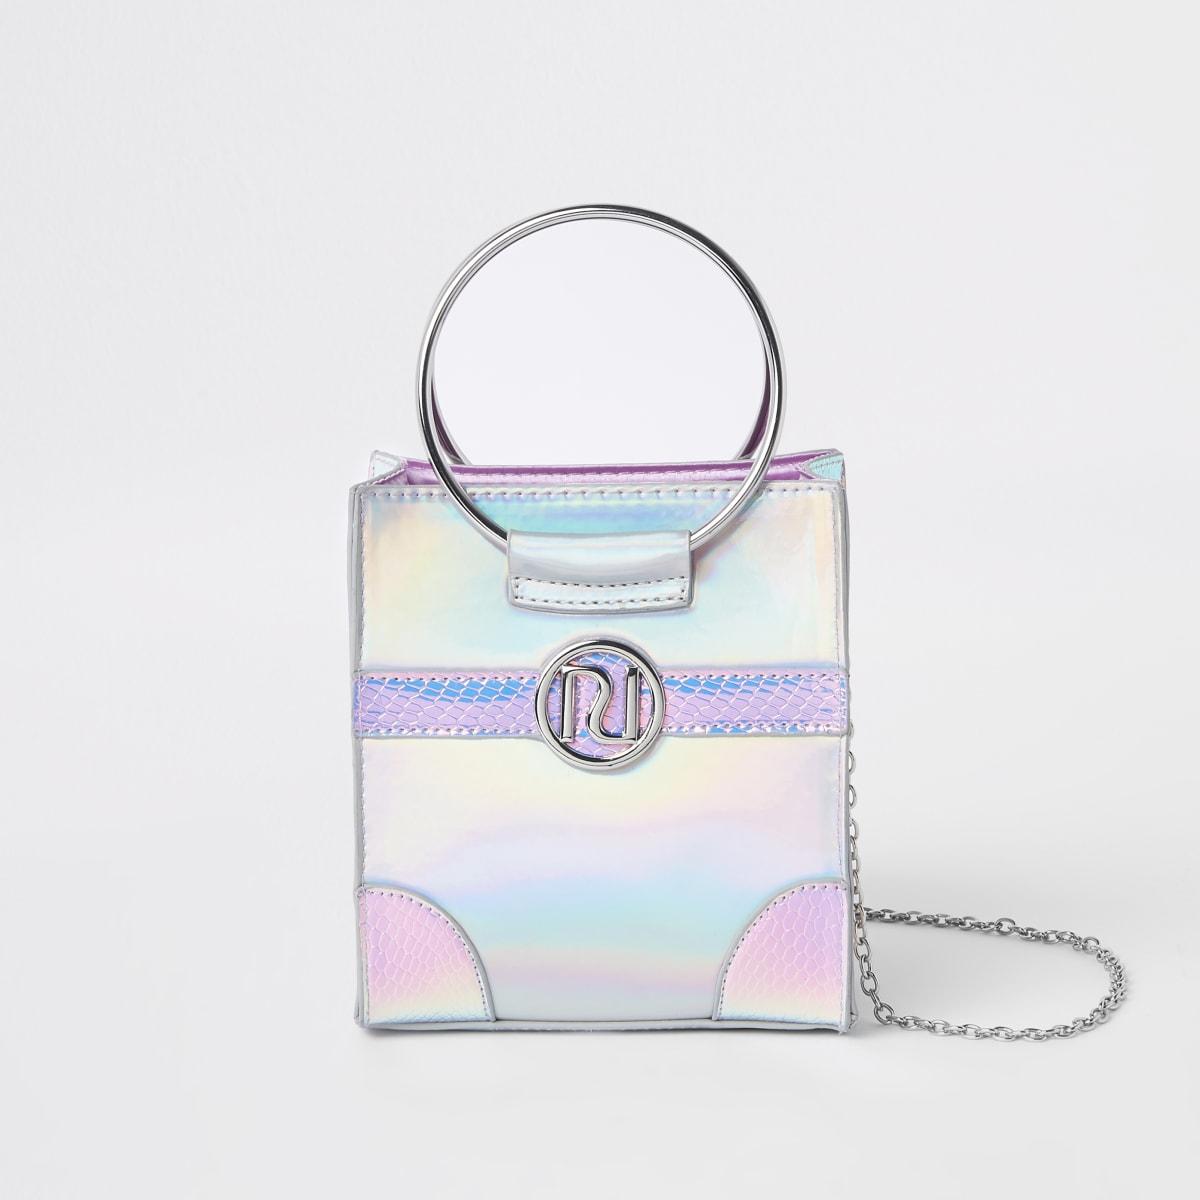 Girls silver holographic boxy cross body bag